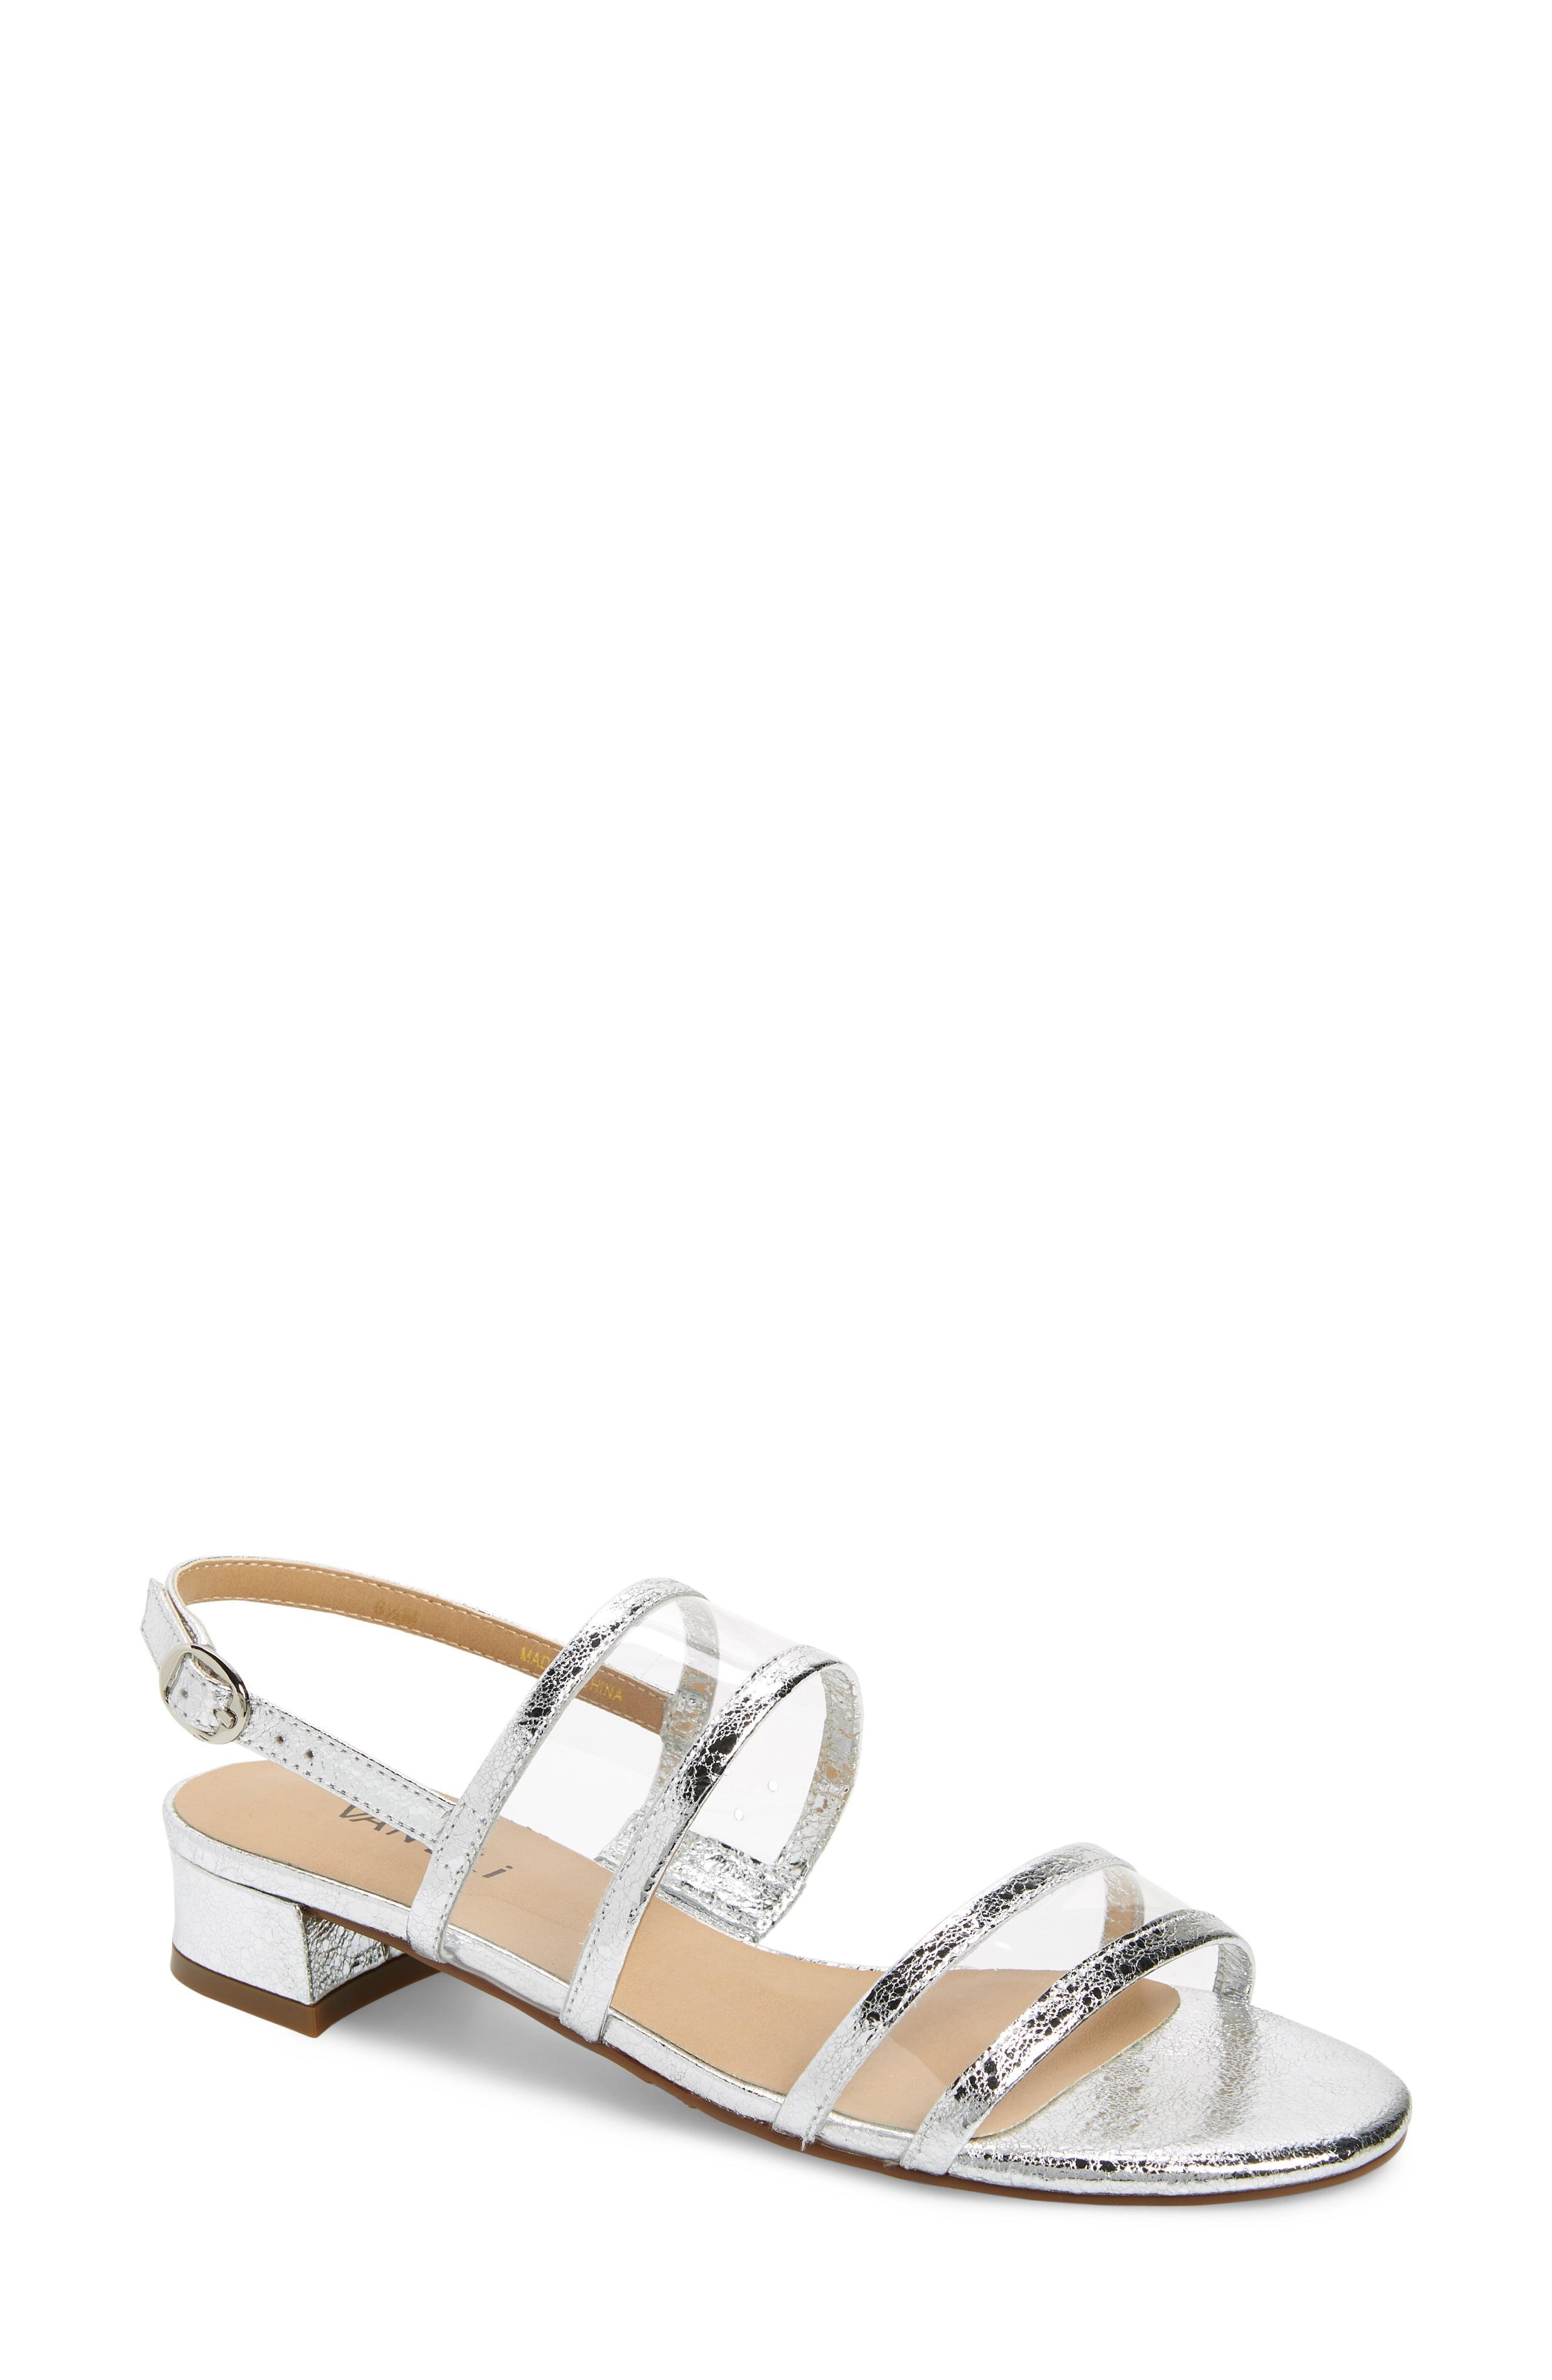 ea1d23414 Lyst - Vaneli Ulcie Transparent Sandal in Metallic